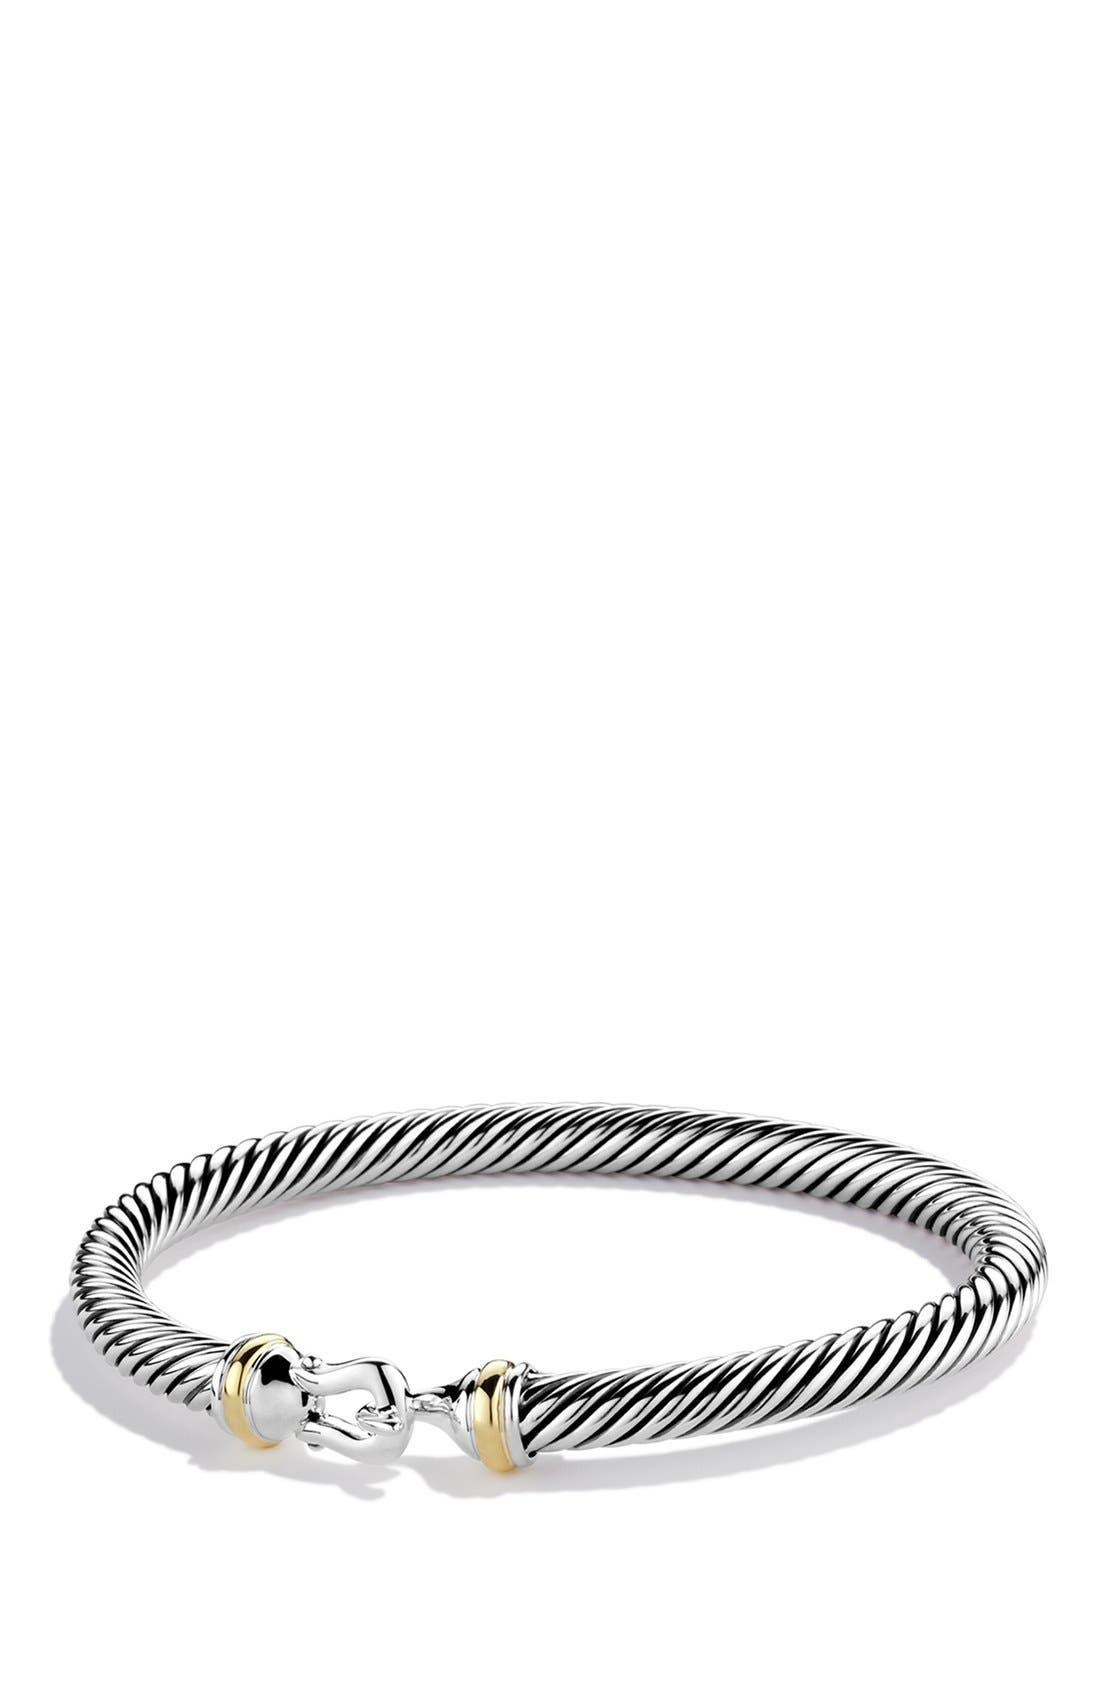 Alternate Image 1 Selected - David Yurman 'Cable Buckle' Bracelet